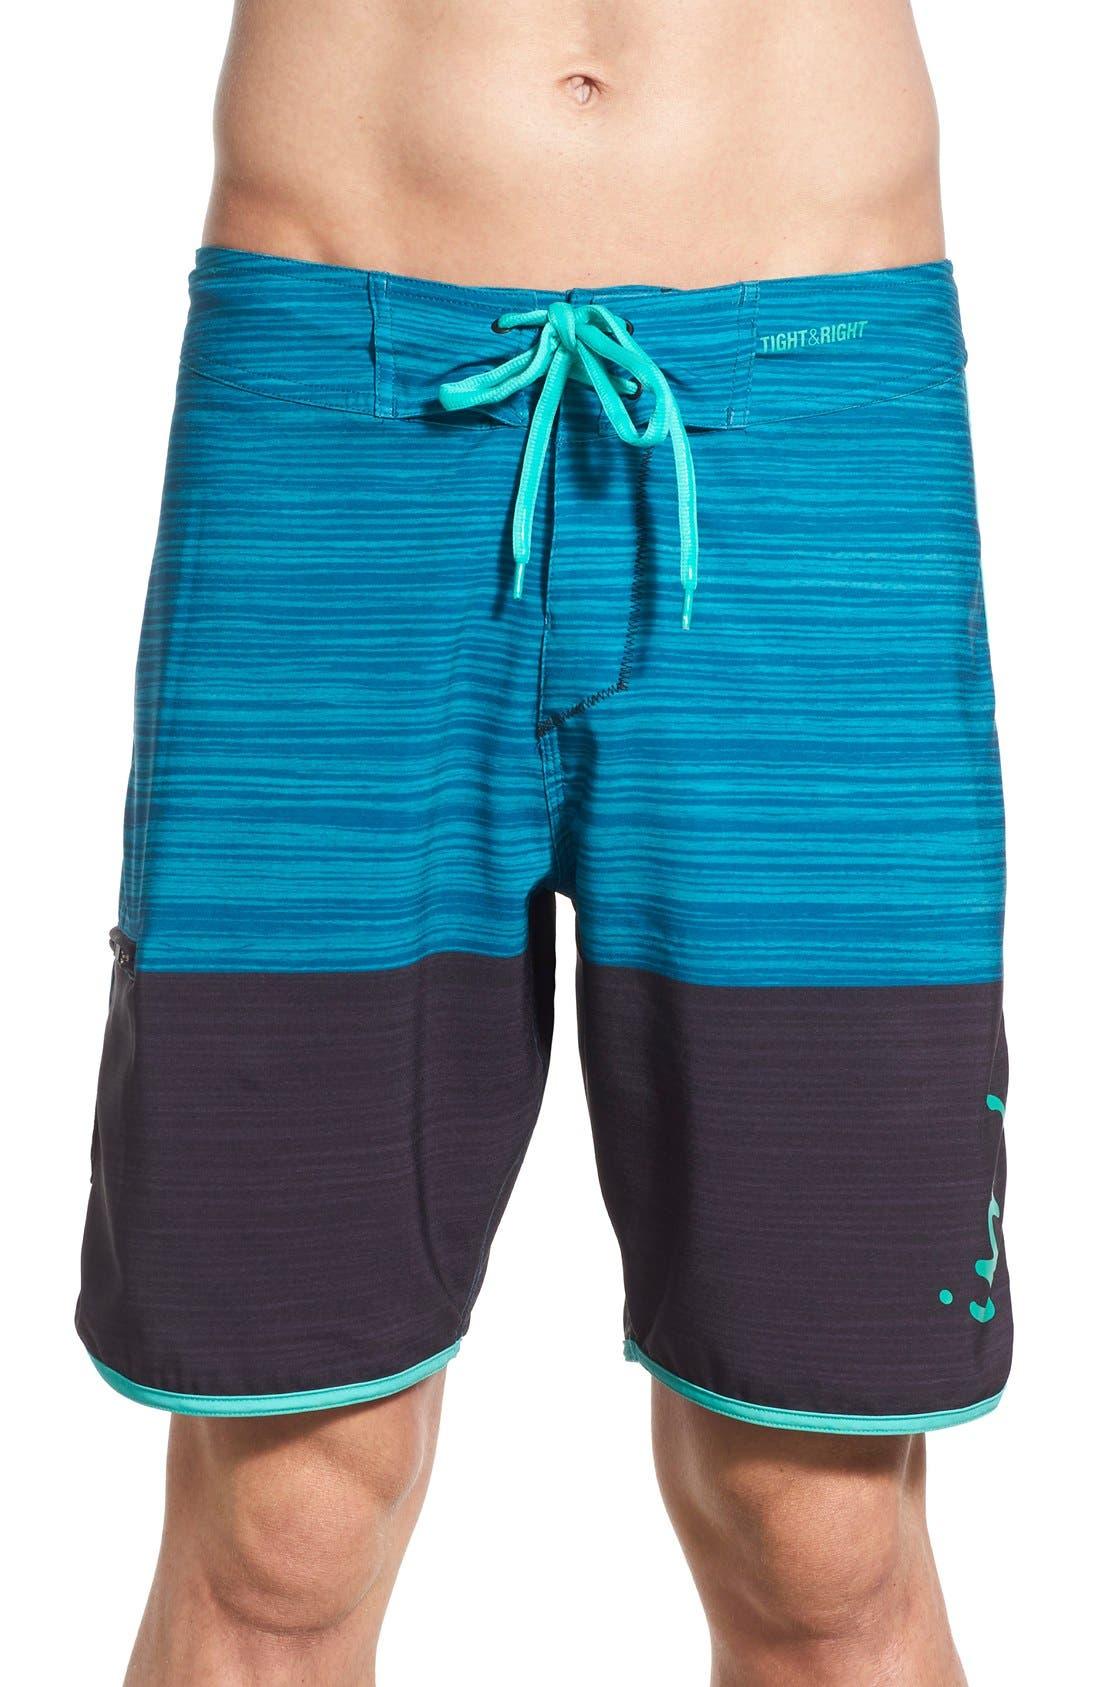 Imperial Motion 'Vislon' Board Shorts